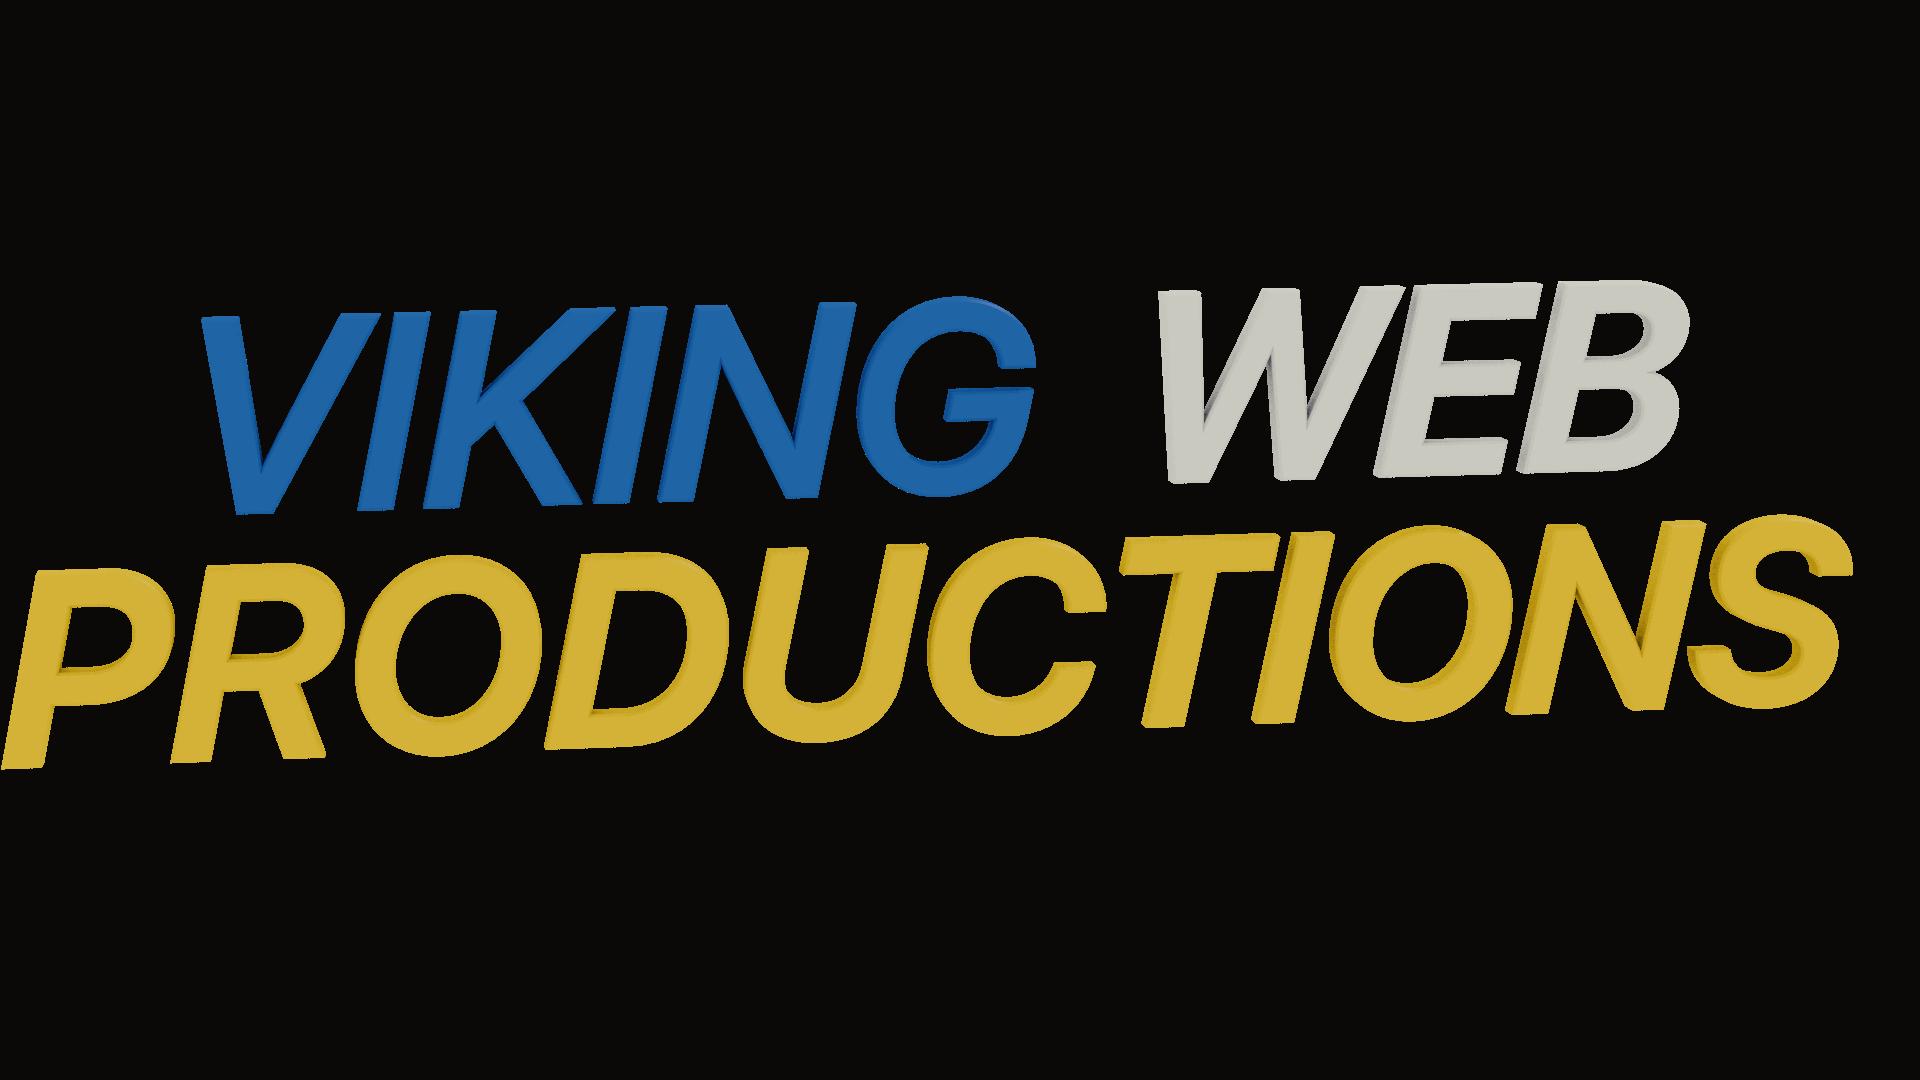 viking web productions logo